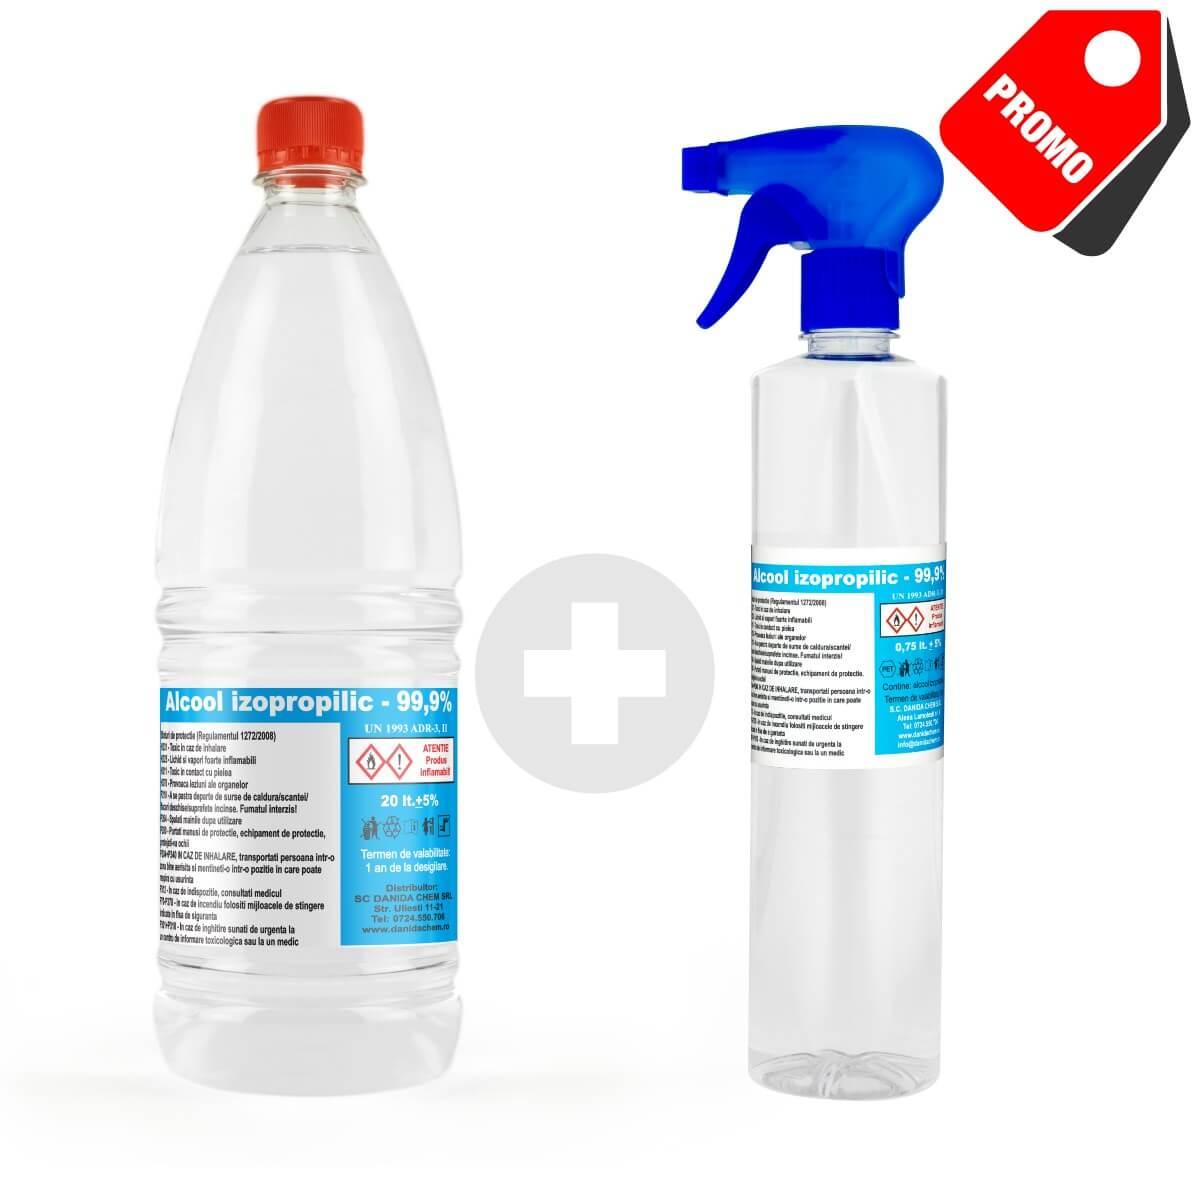 Pachet promotional alcool izopropilic pulverizator Danida Chem